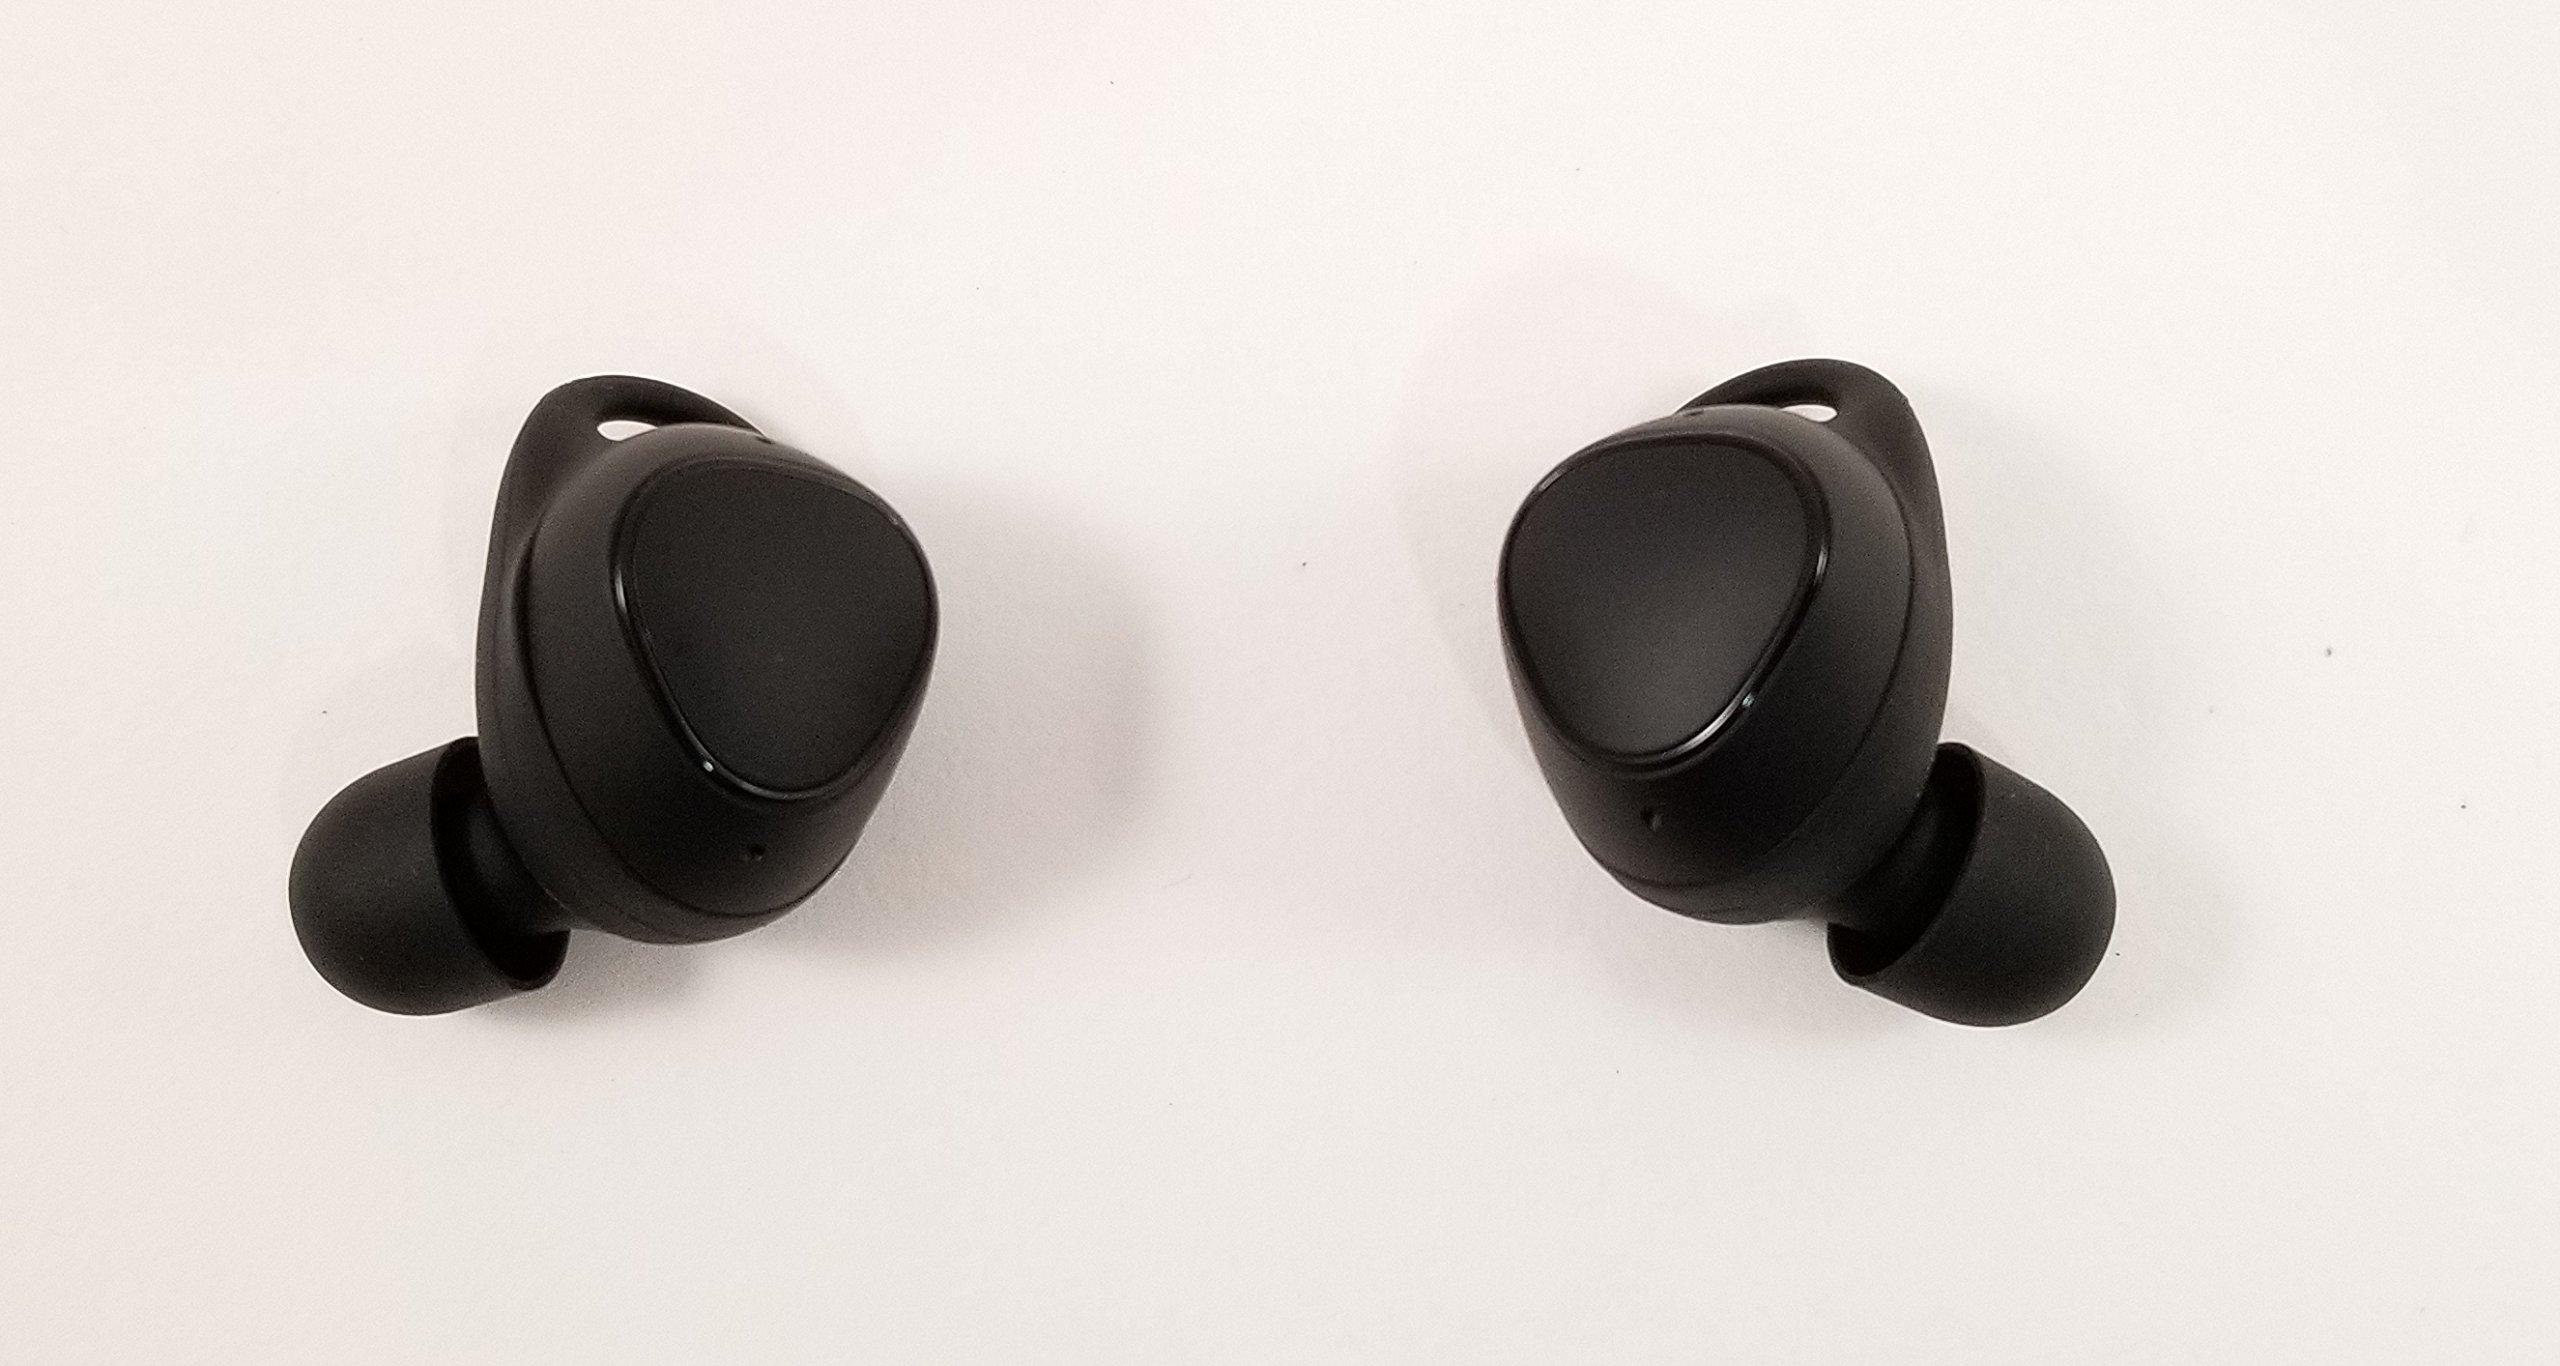 Samsung Gear IconX (2018 Edition) Cord-free Fitness Earbuds (International Version -No Warranty) (Black)